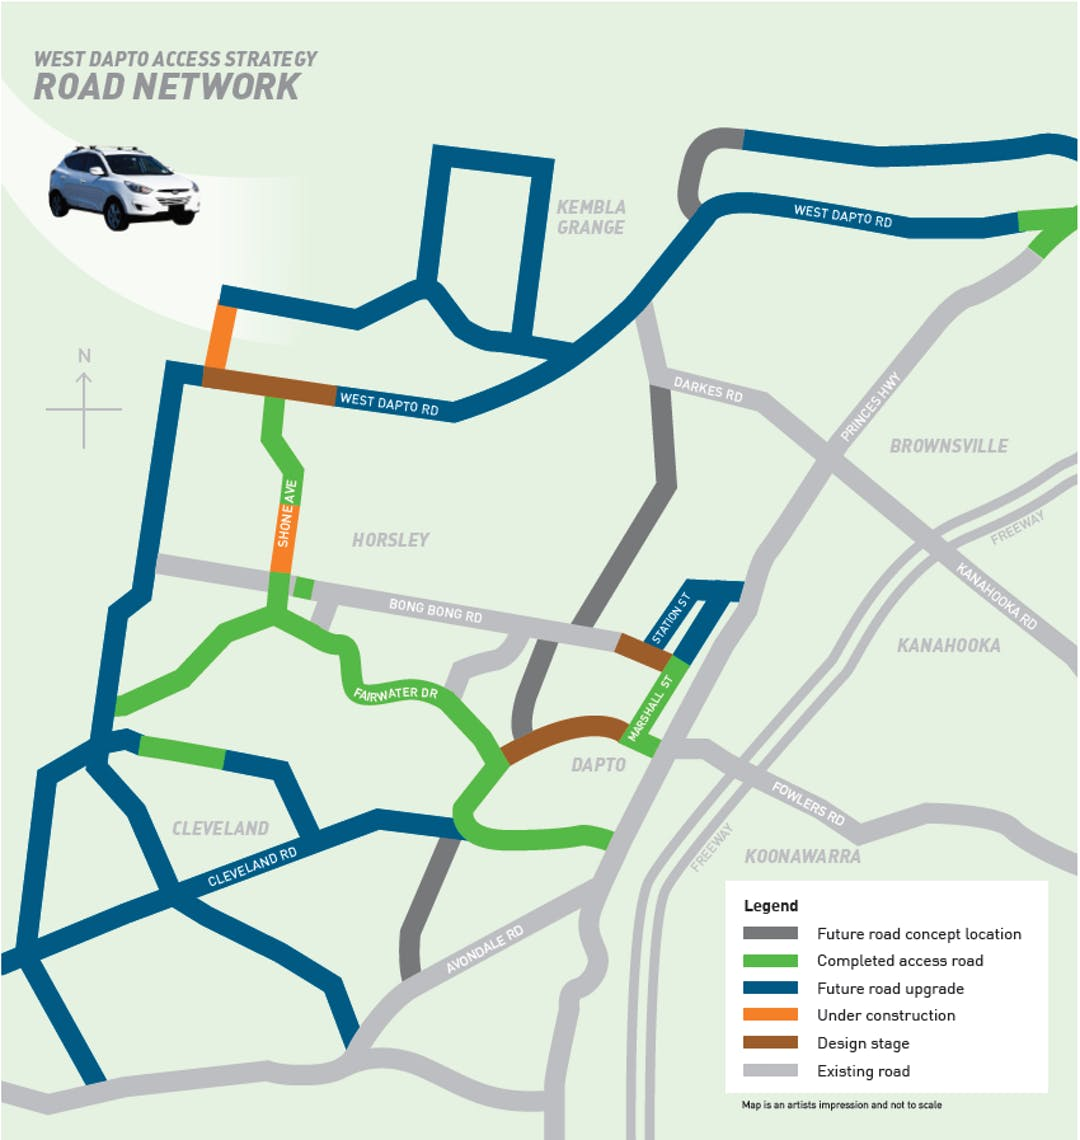 West dapto access strategy mud map